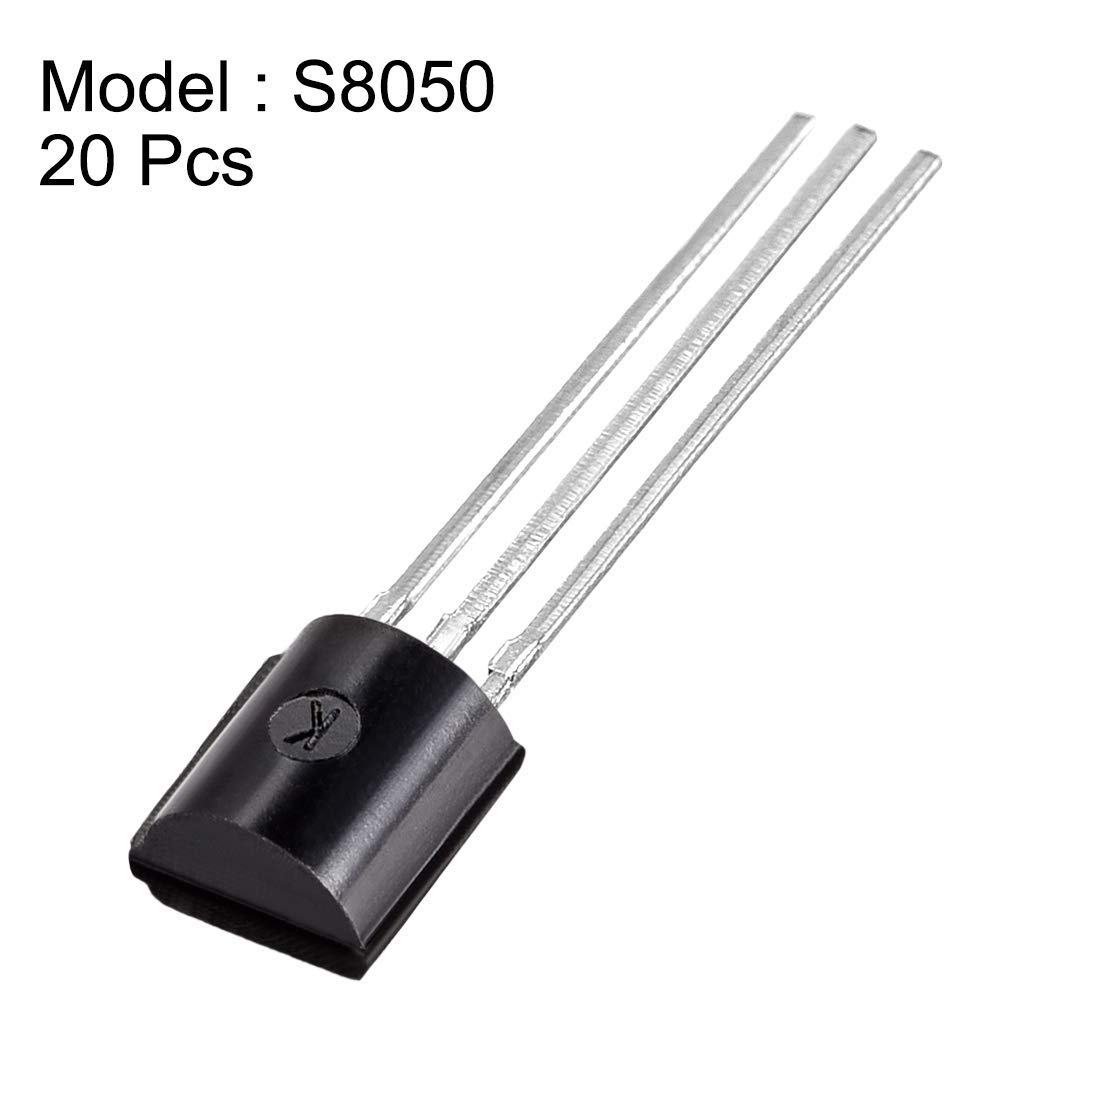 S8050 NPN TO-92 20pcs encapsulated Plastic Power Transistor